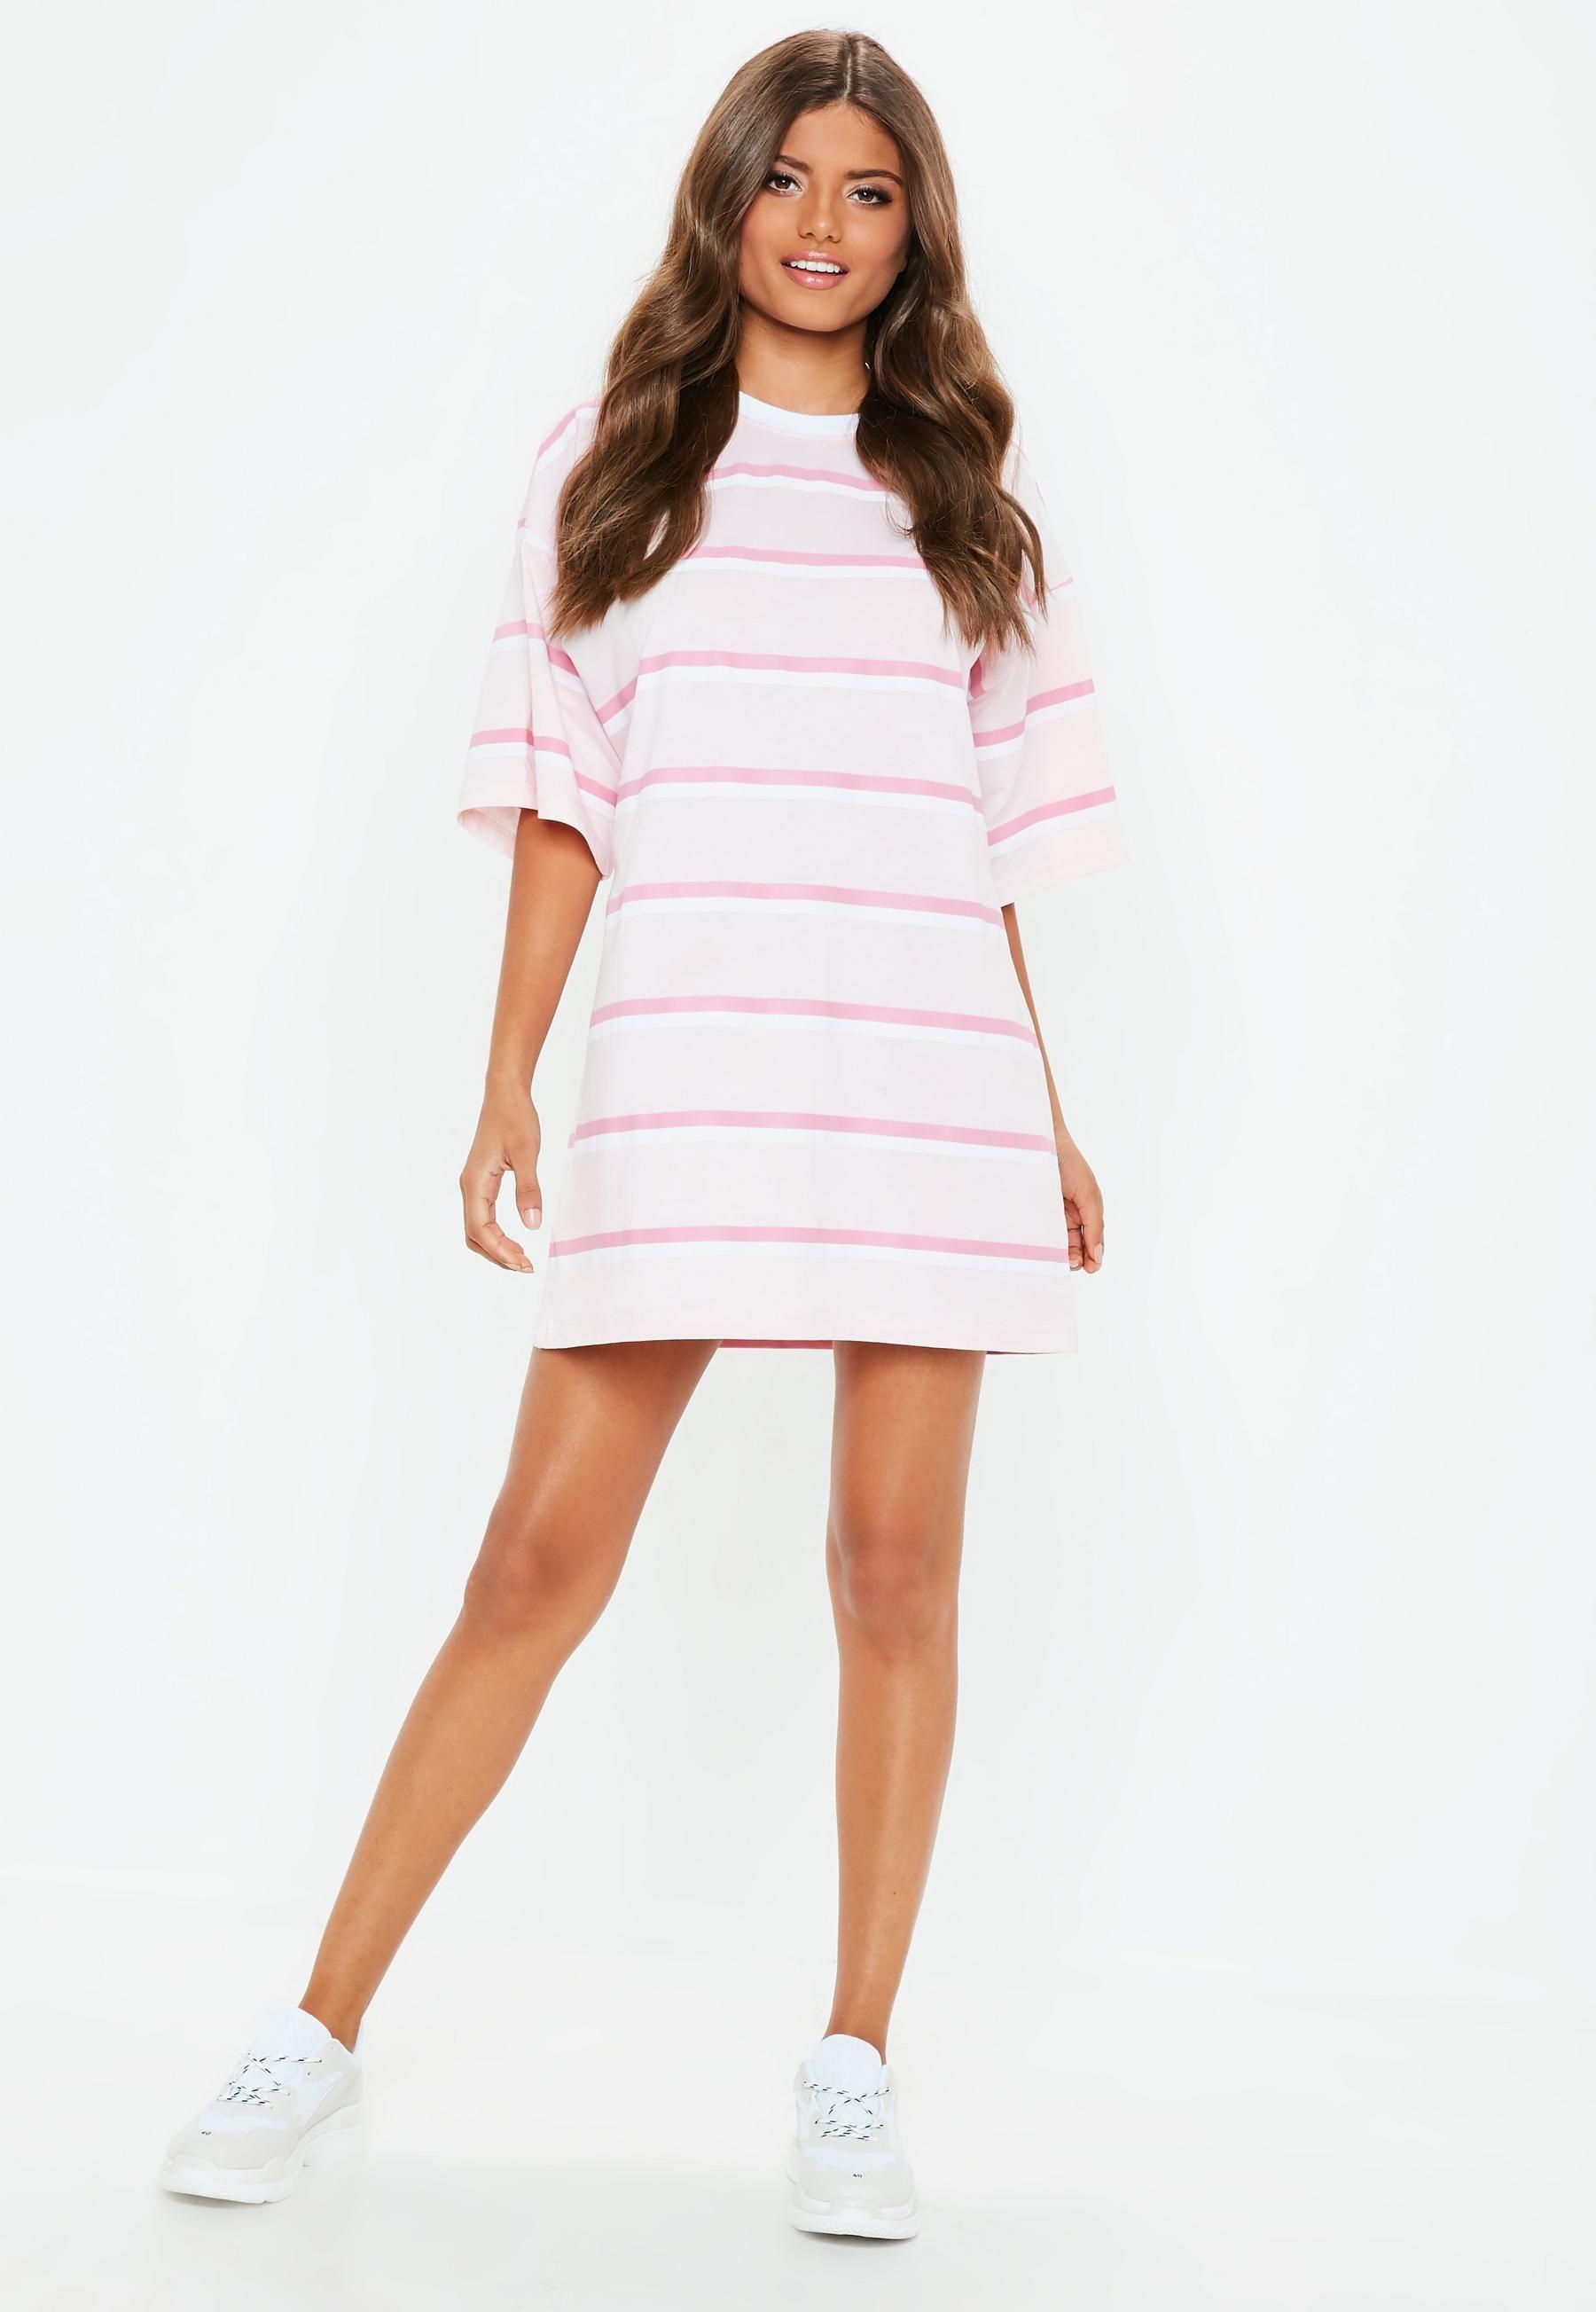 a4e55baa Pink Striped Oversized T shirt Dress   Missguided   Fkin fits ...